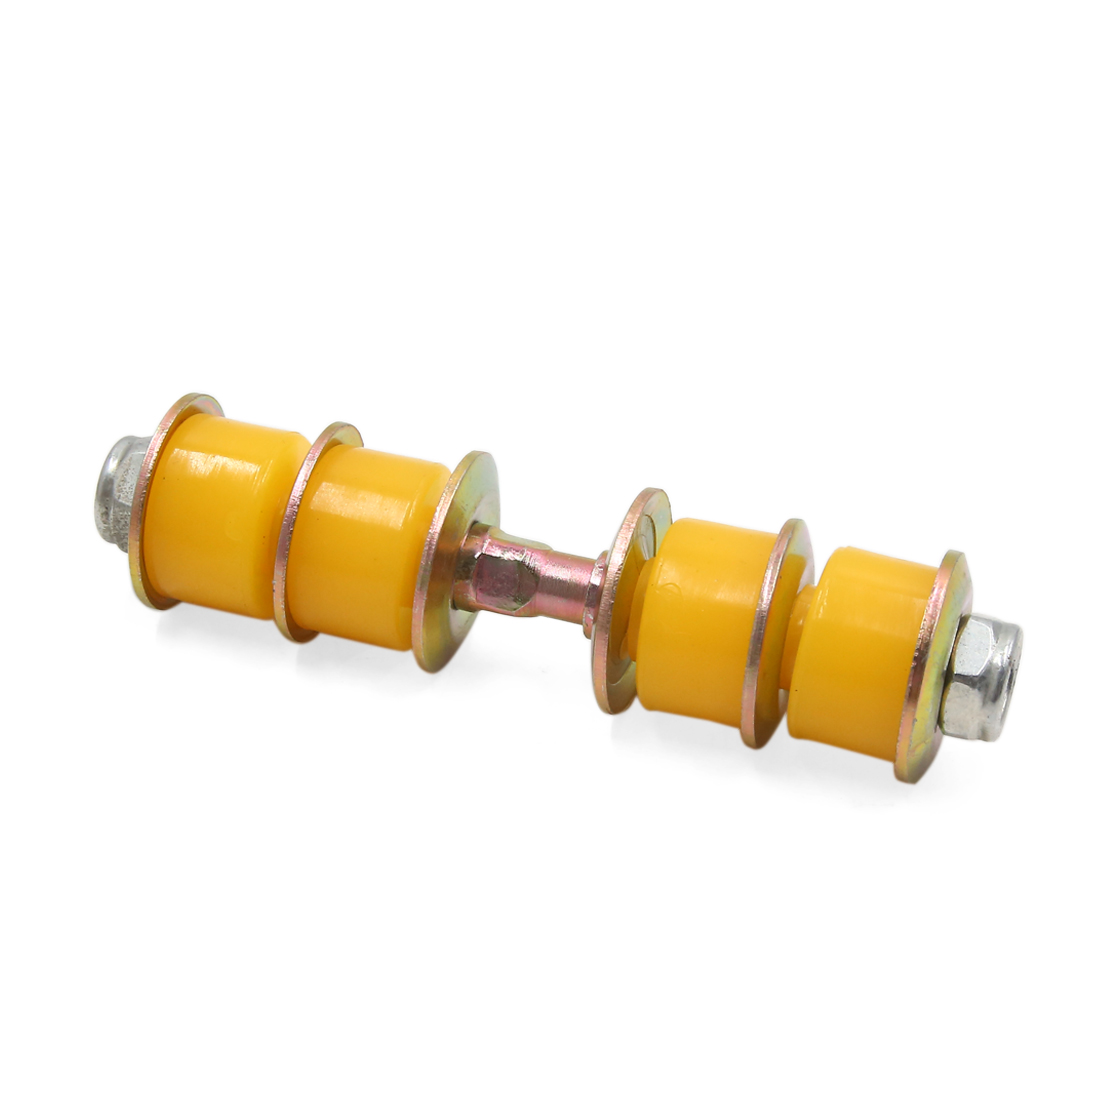 133cm Length Metal Front Suspension Sway Stabilizer Bar Arm Control Link for Car